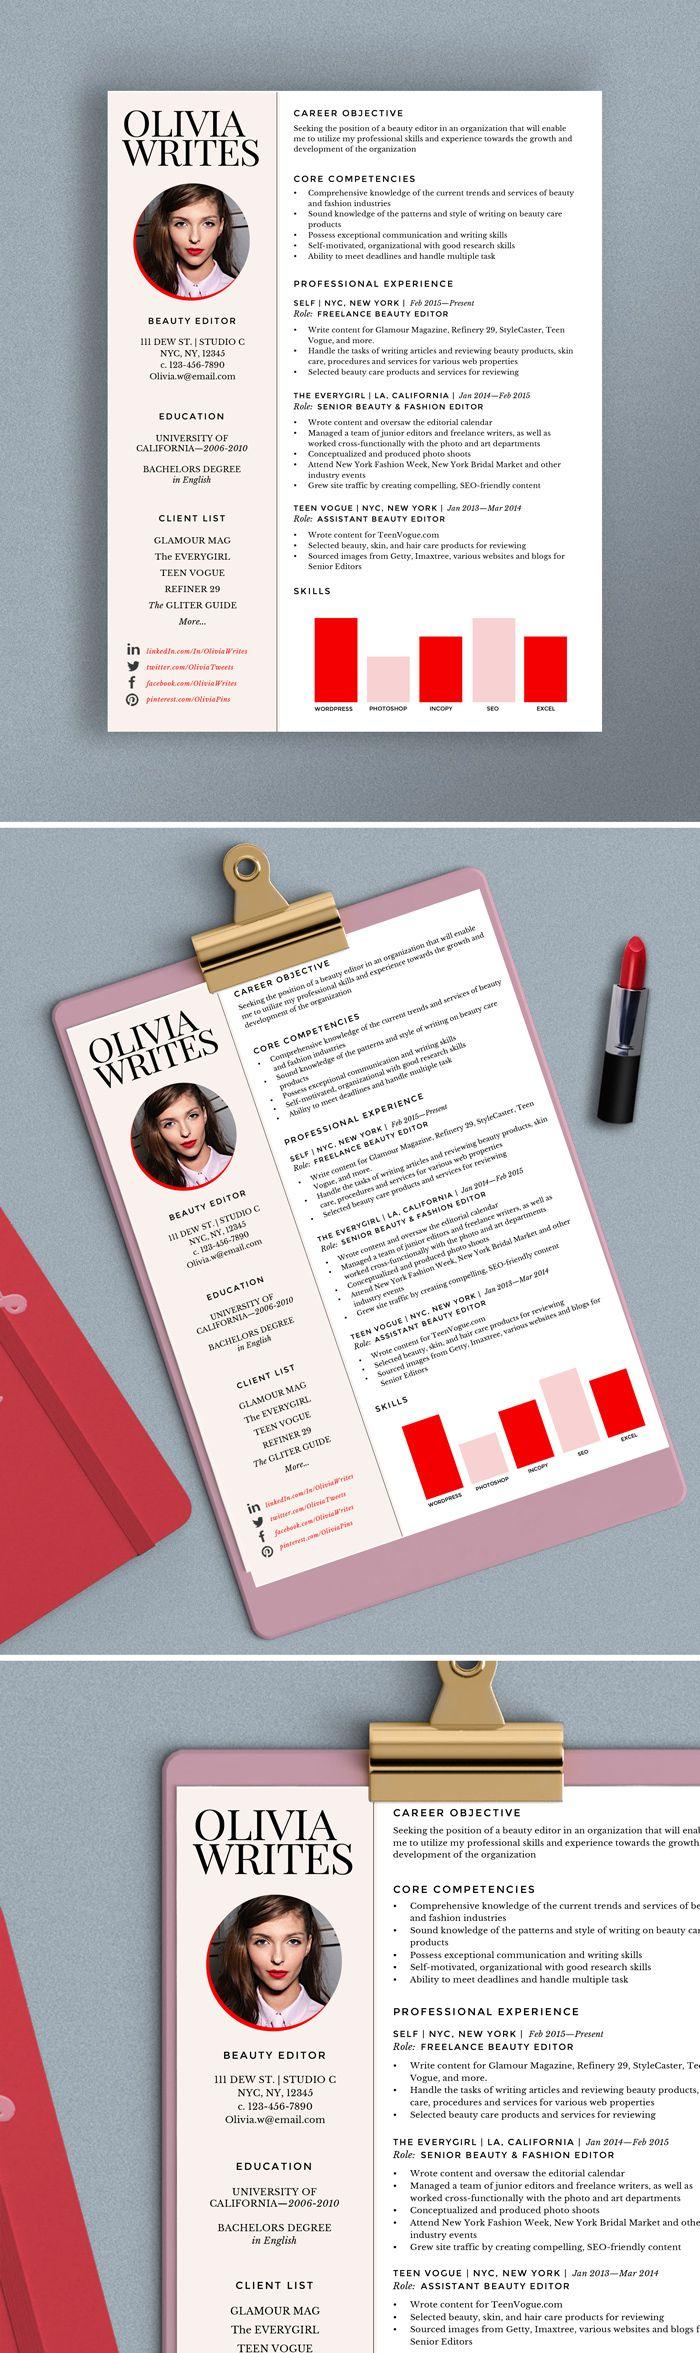 Fully Editable Modern Feminine Resume Template Design Beauty Editor Fashion Editor Writer Photographer Or Stylist Resume Design Creative Cv Creative Cvs